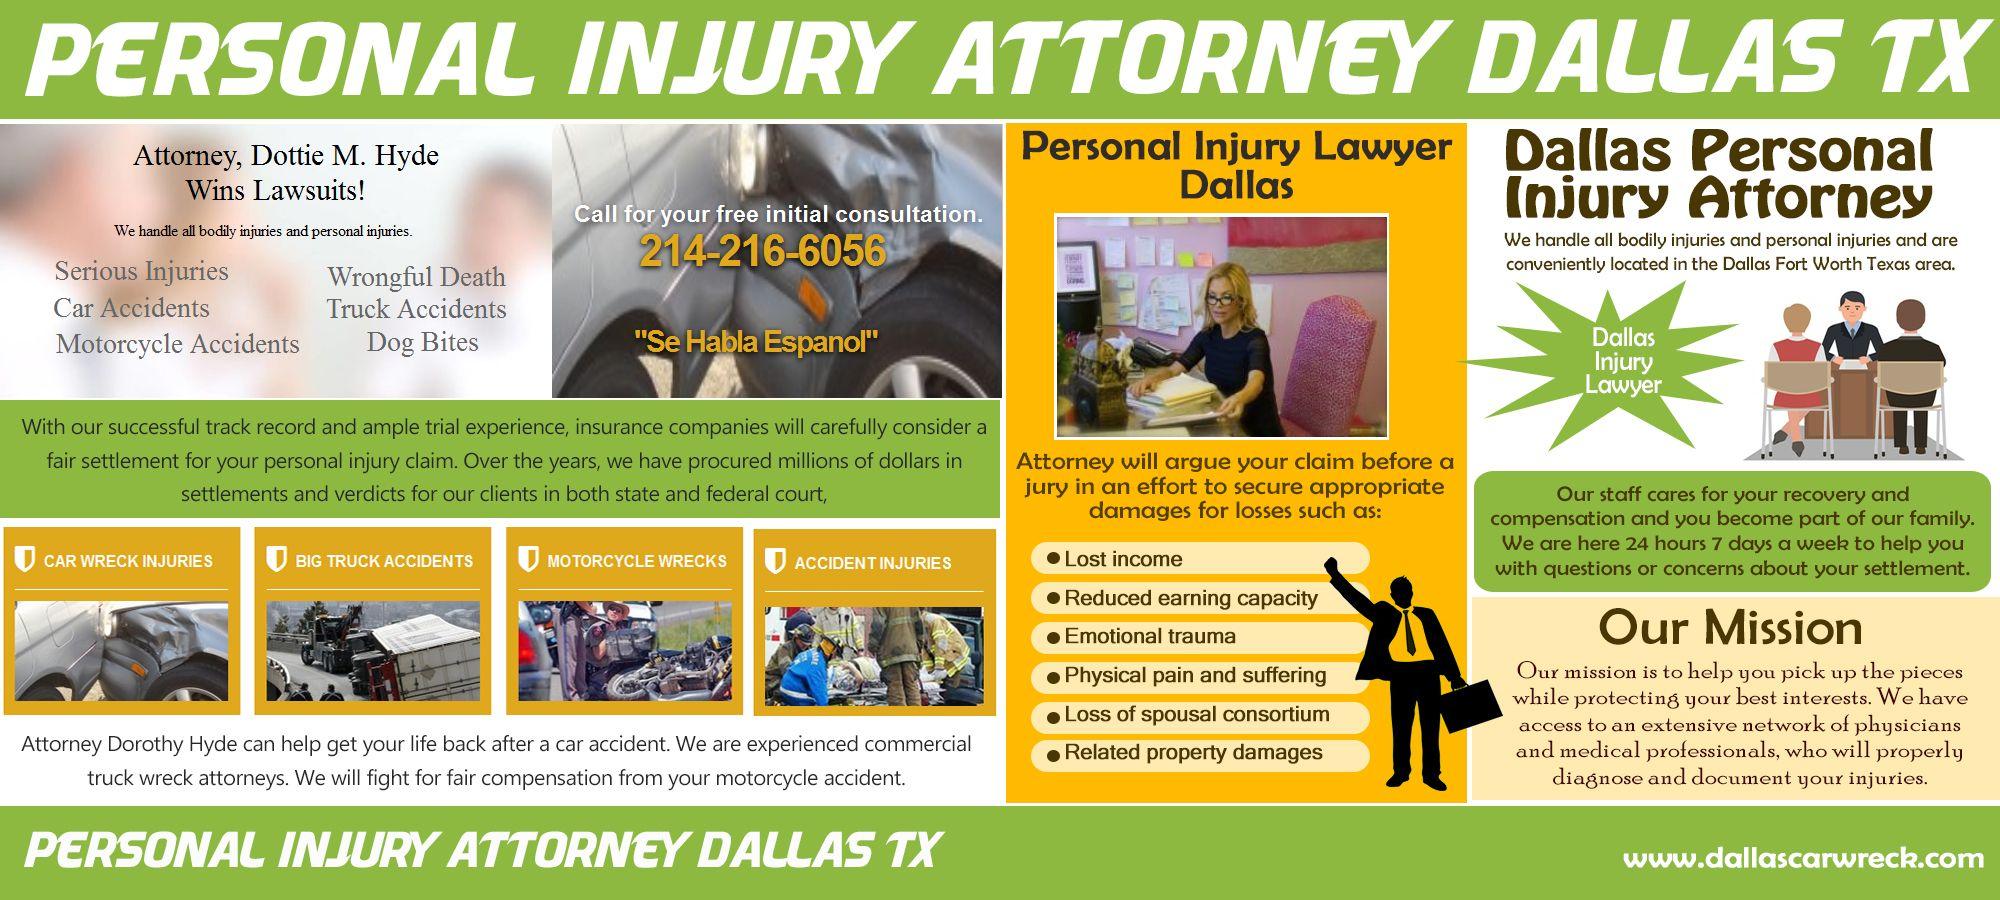 Pin By Dallas Injury Lawyer On Personal Injury Lawyer Dallas